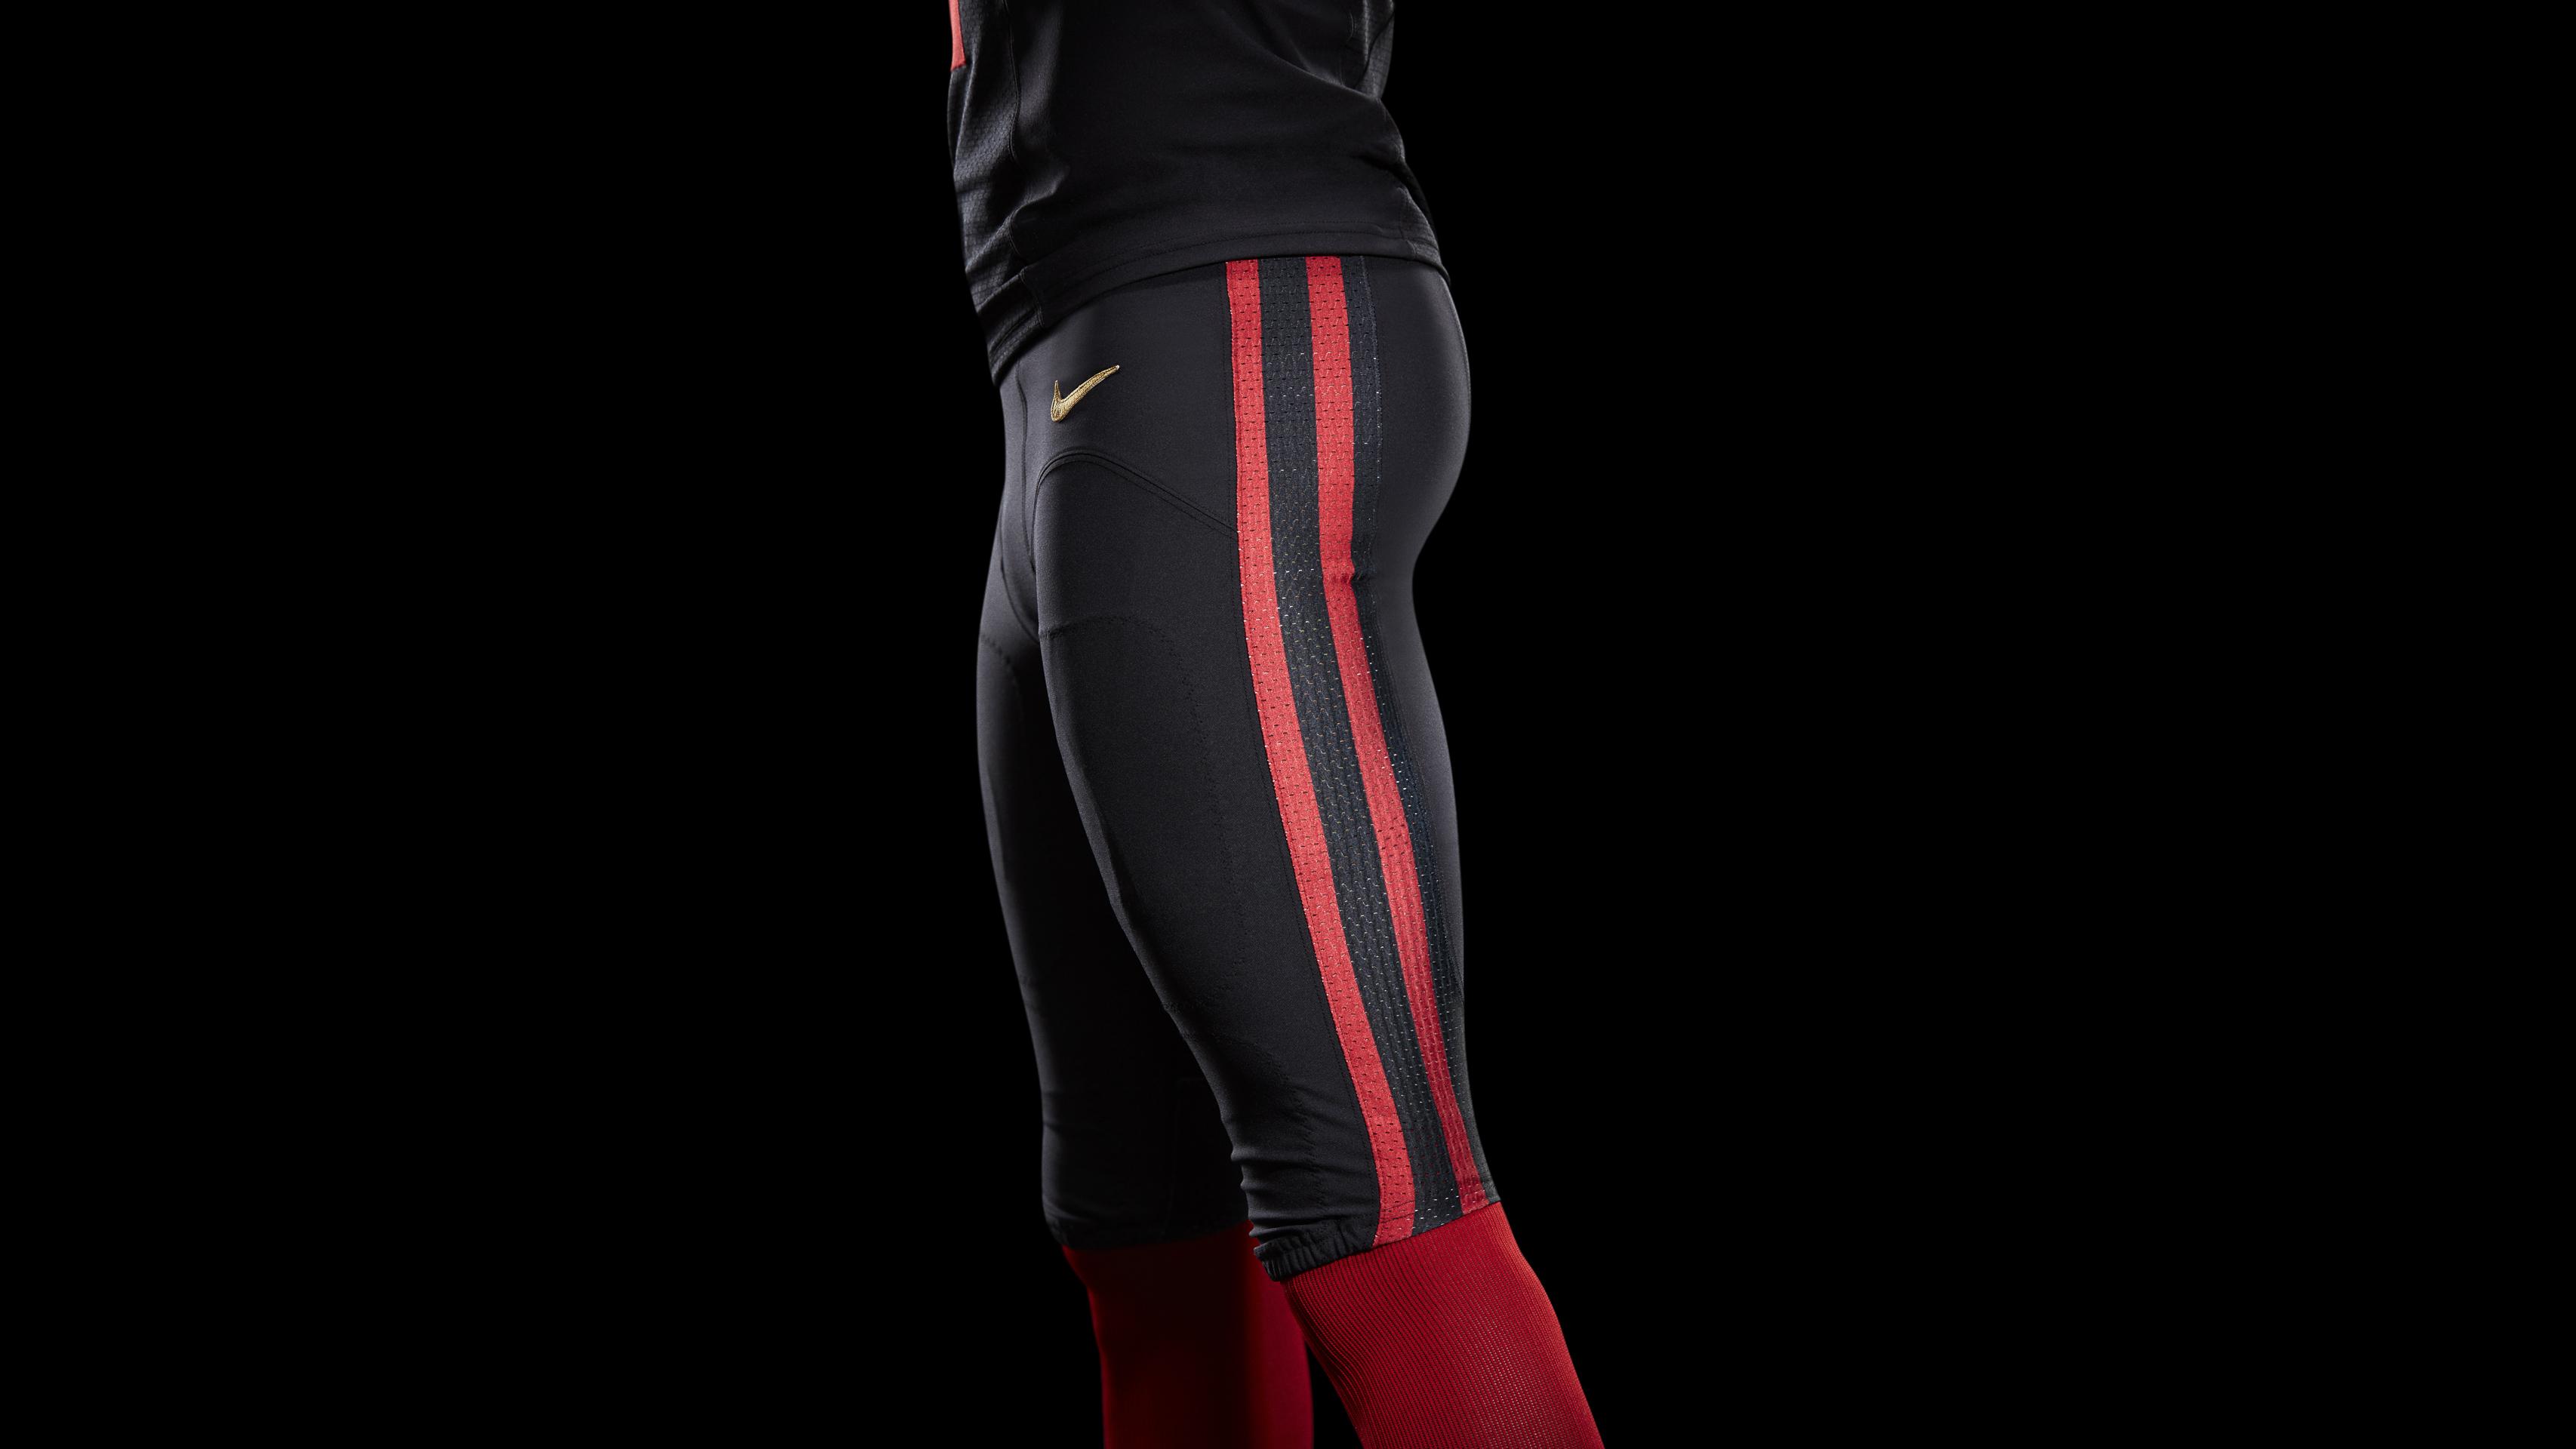 online retailer f89fe ec0b6 San Francisco 49ers Get New All-Black Alternate Uniforms ...